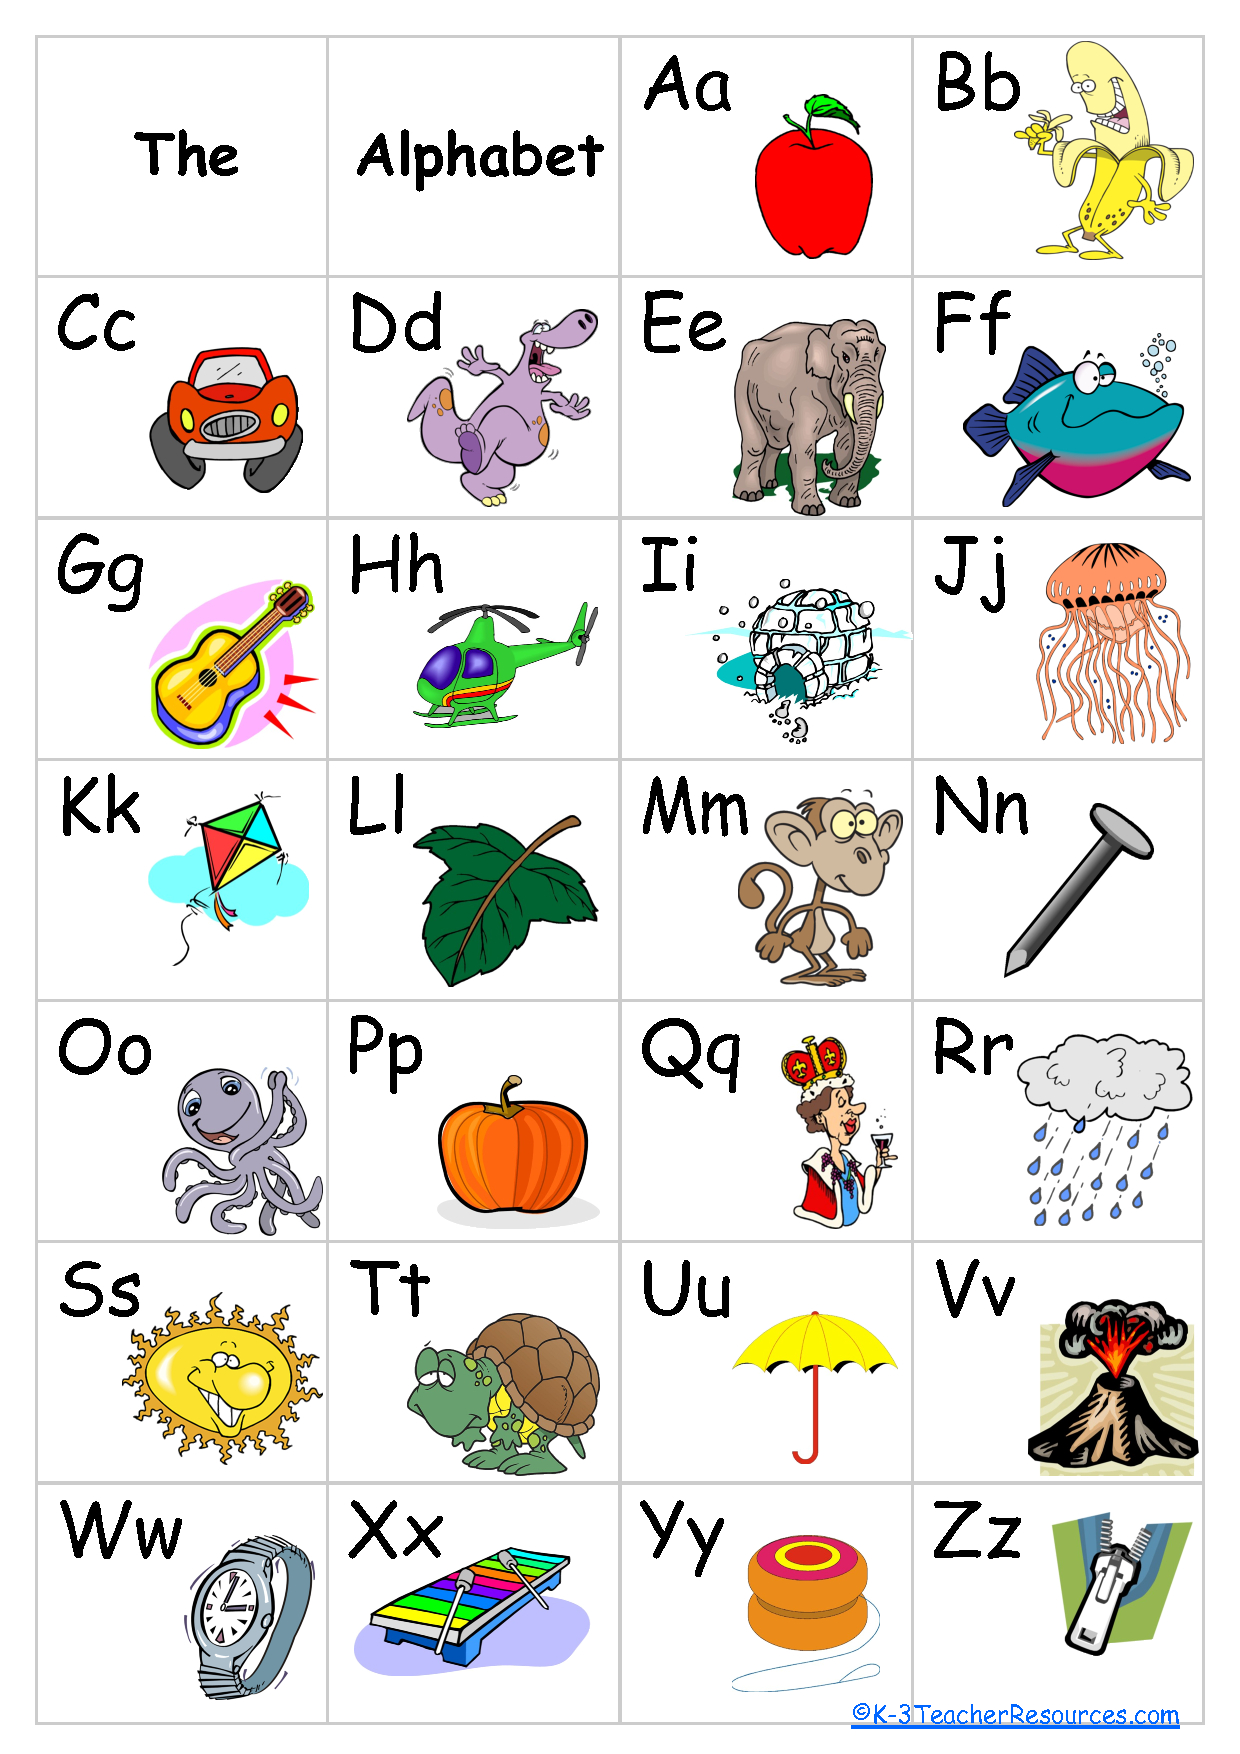 Free+Printable+Alphabet+Chart | Schoolroom Ideas | Alphabet Charts - Free Printable Alphabet Chart